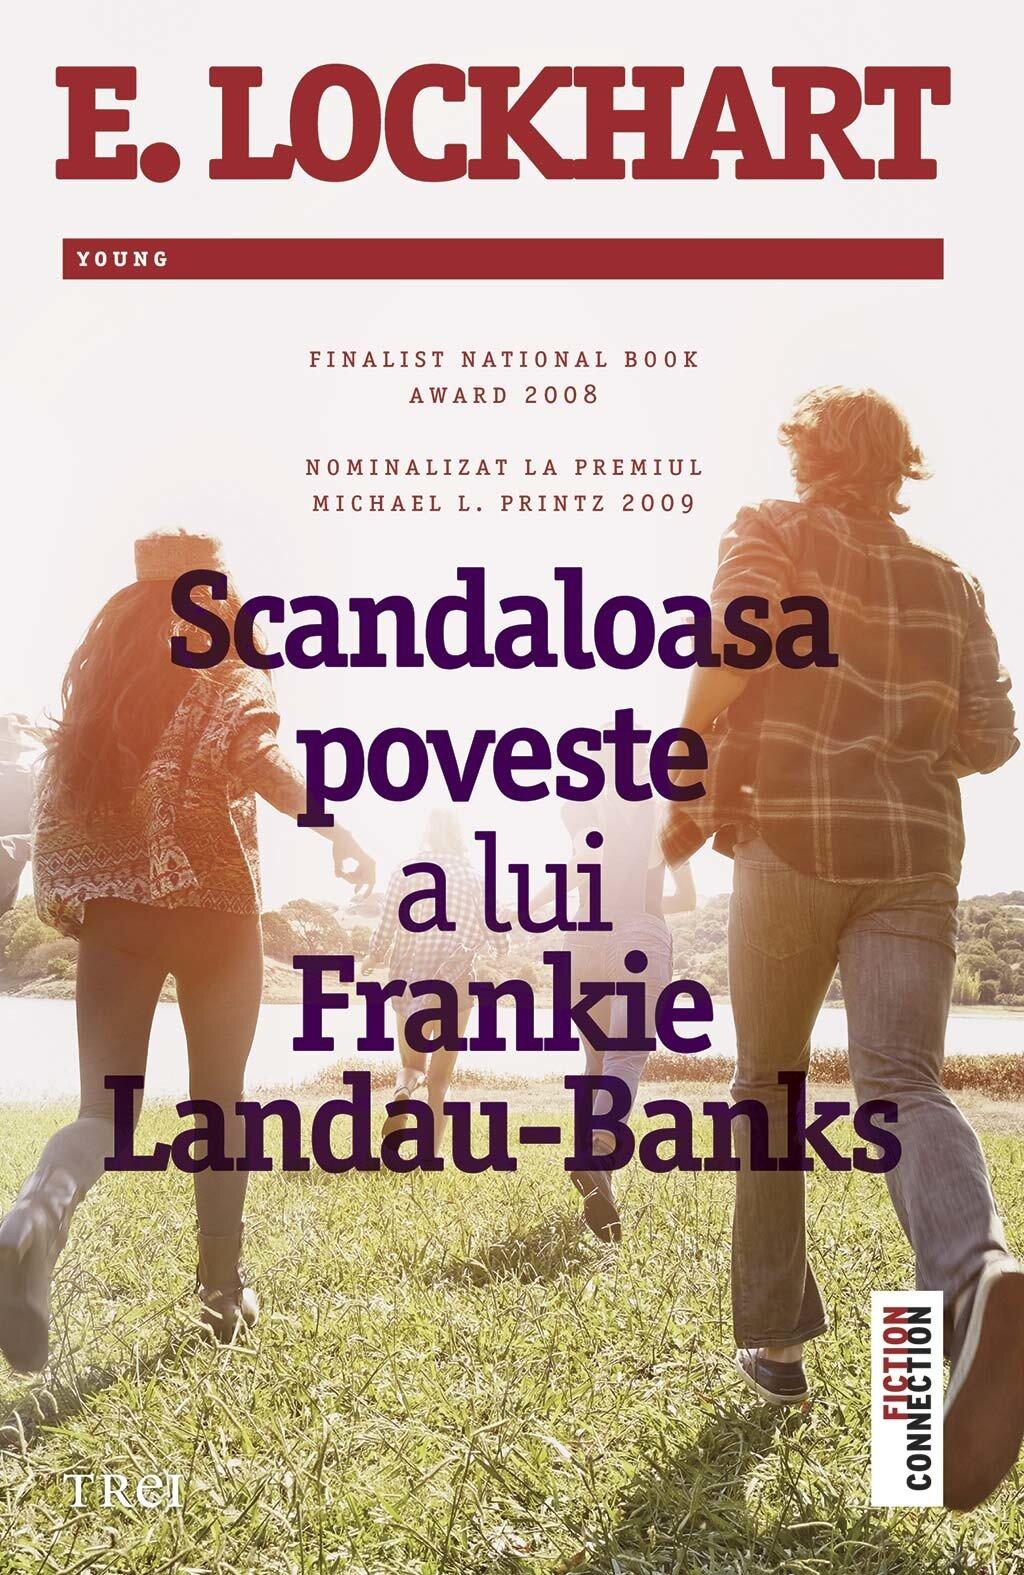 Scandaloasa poveste a lui Frankie Landau-Banks PDF (Download eBook)